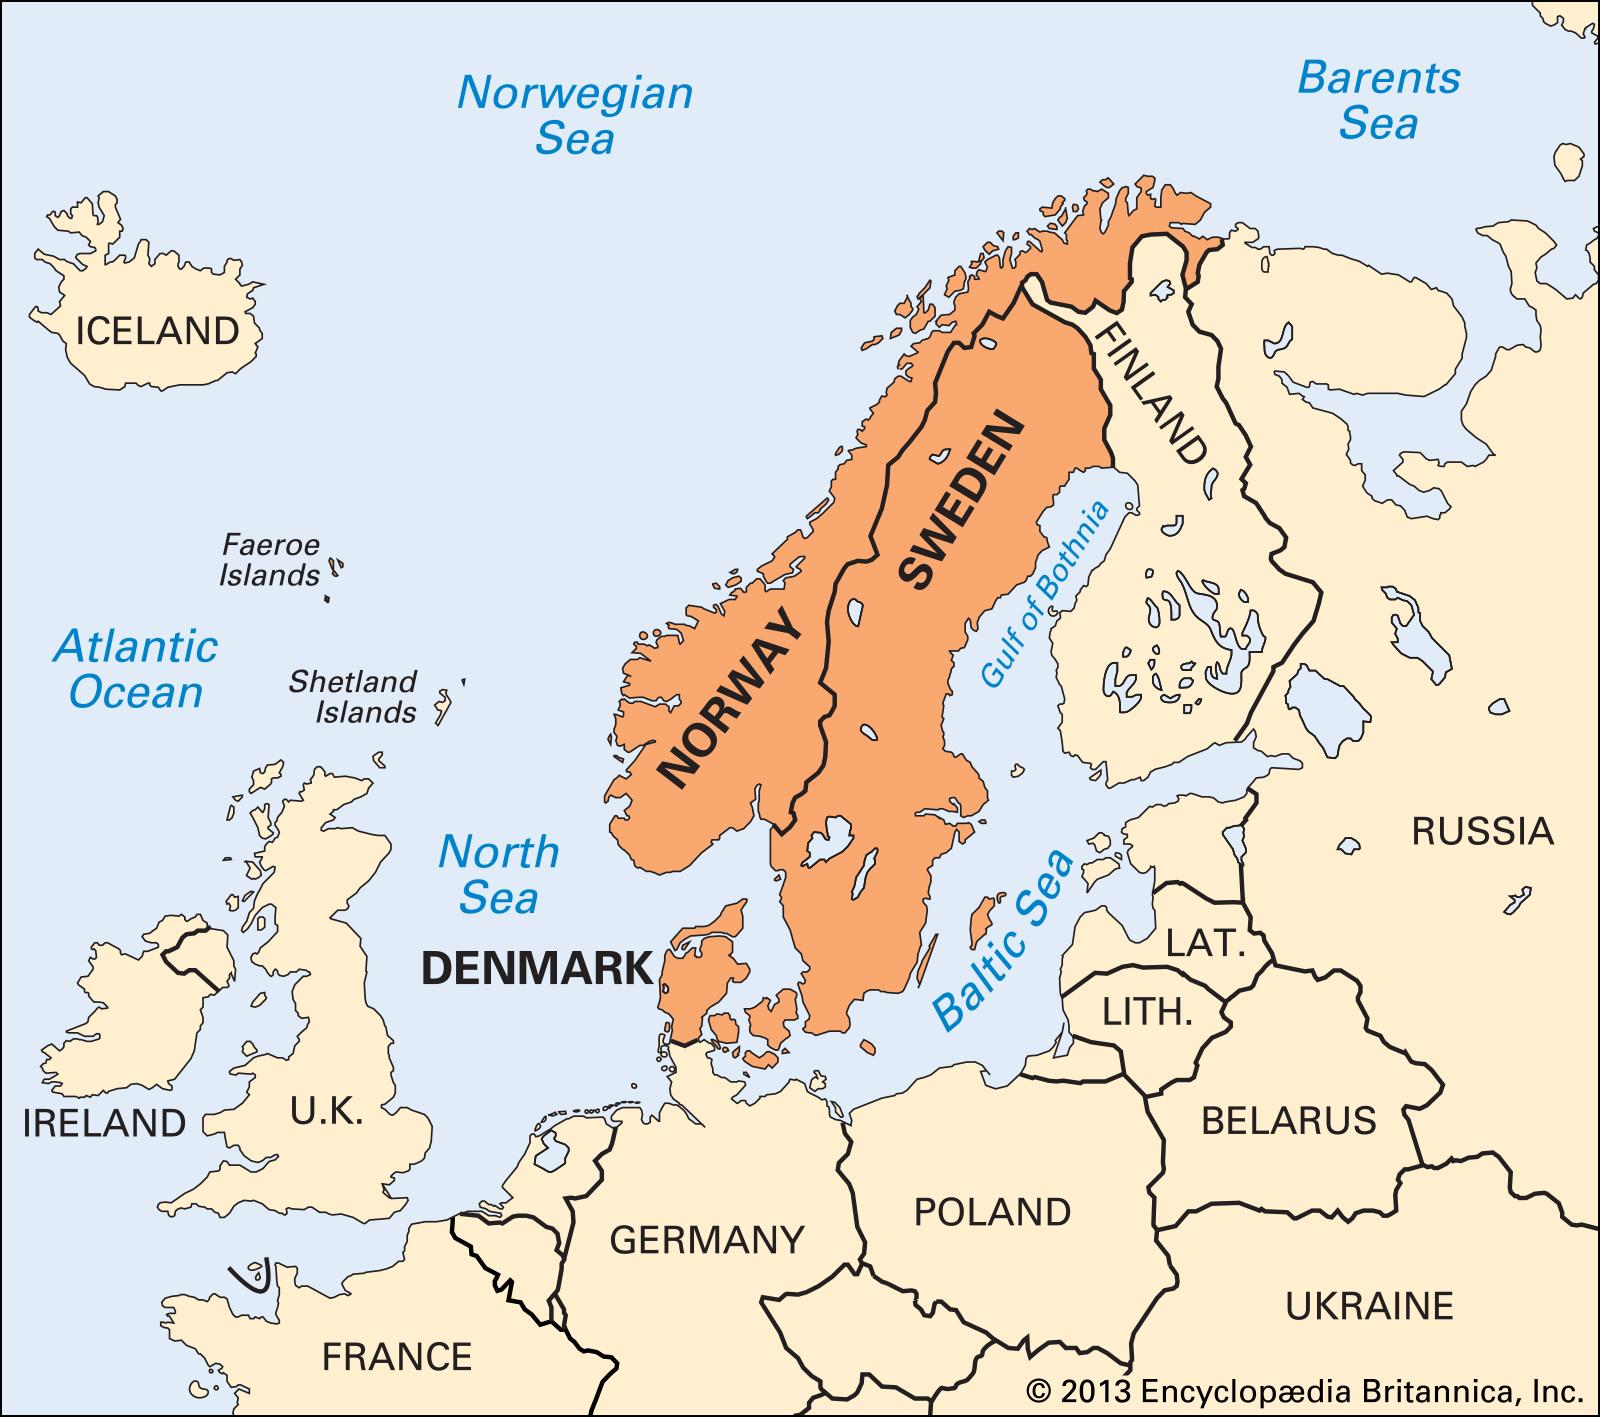 Bán đảo Scandinavia